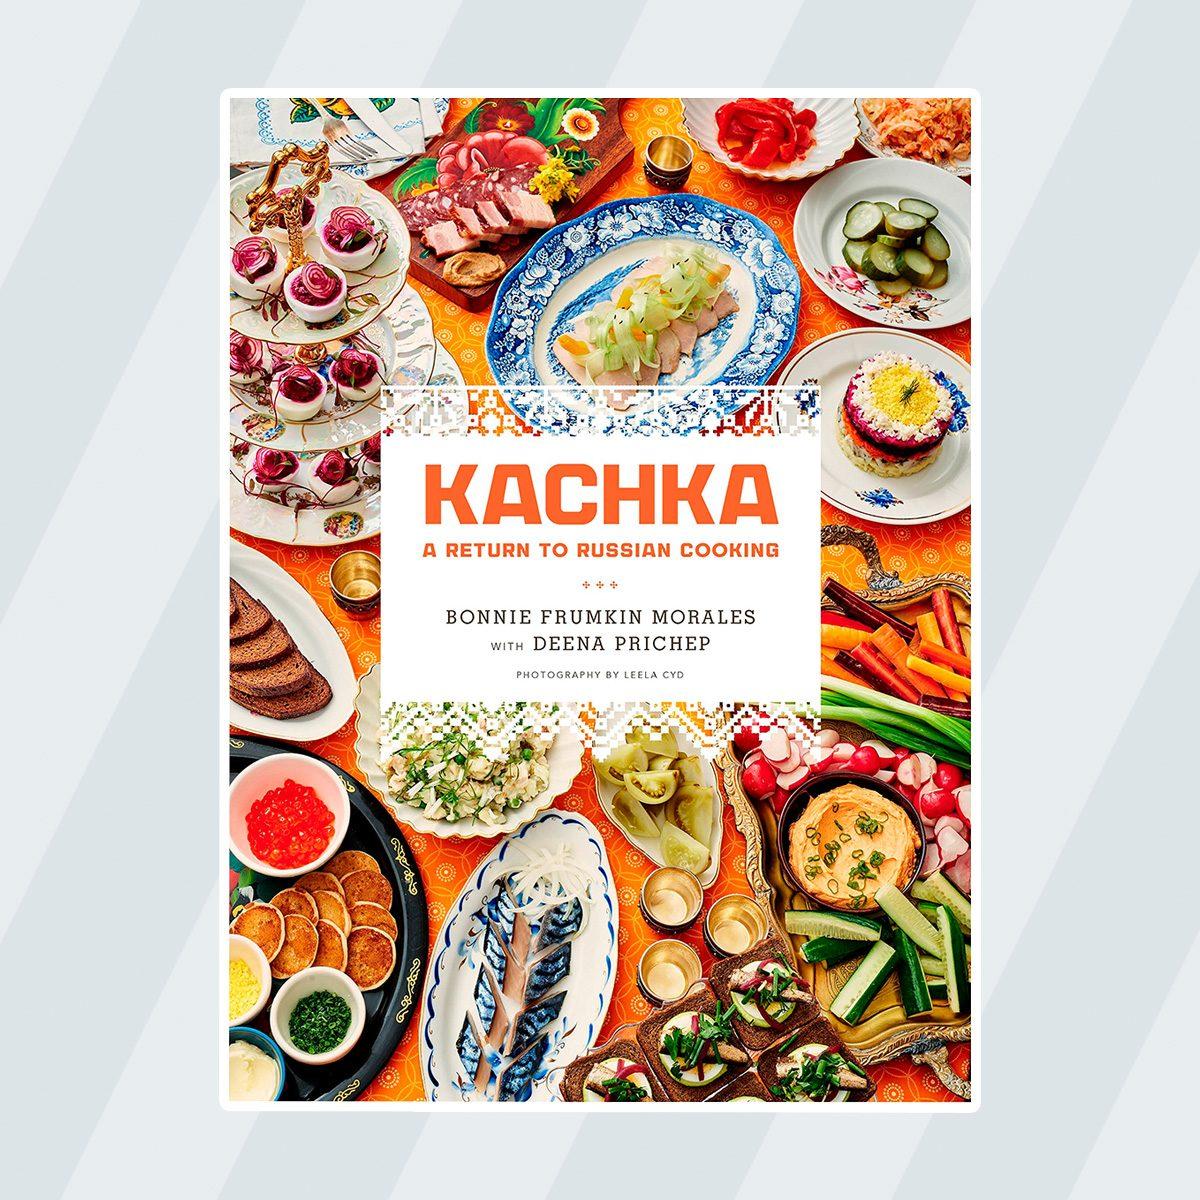 Kachka: A Return to Russian Cooking